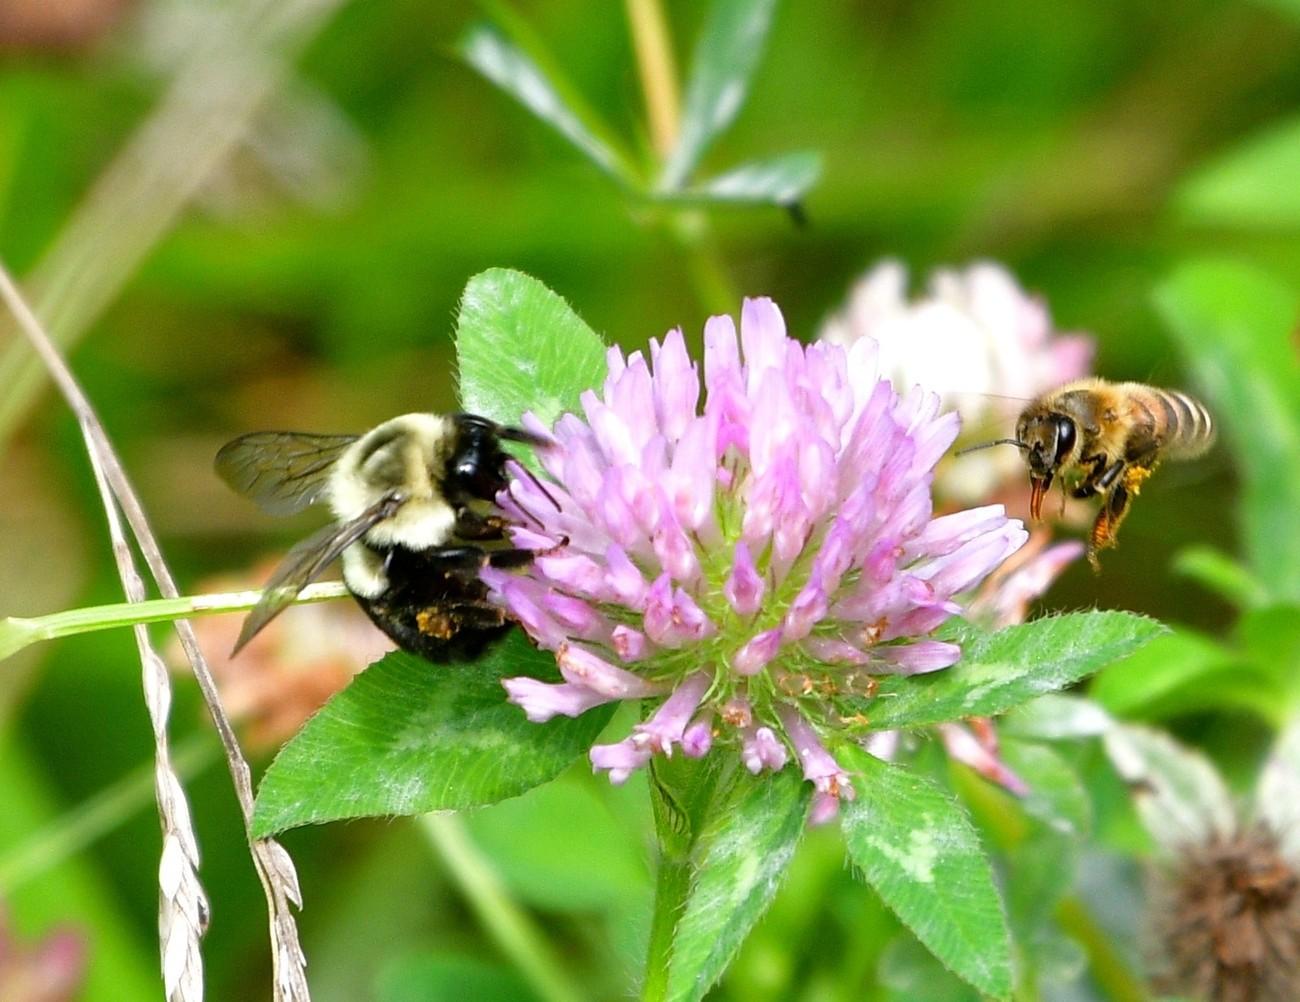 Love these pollinators